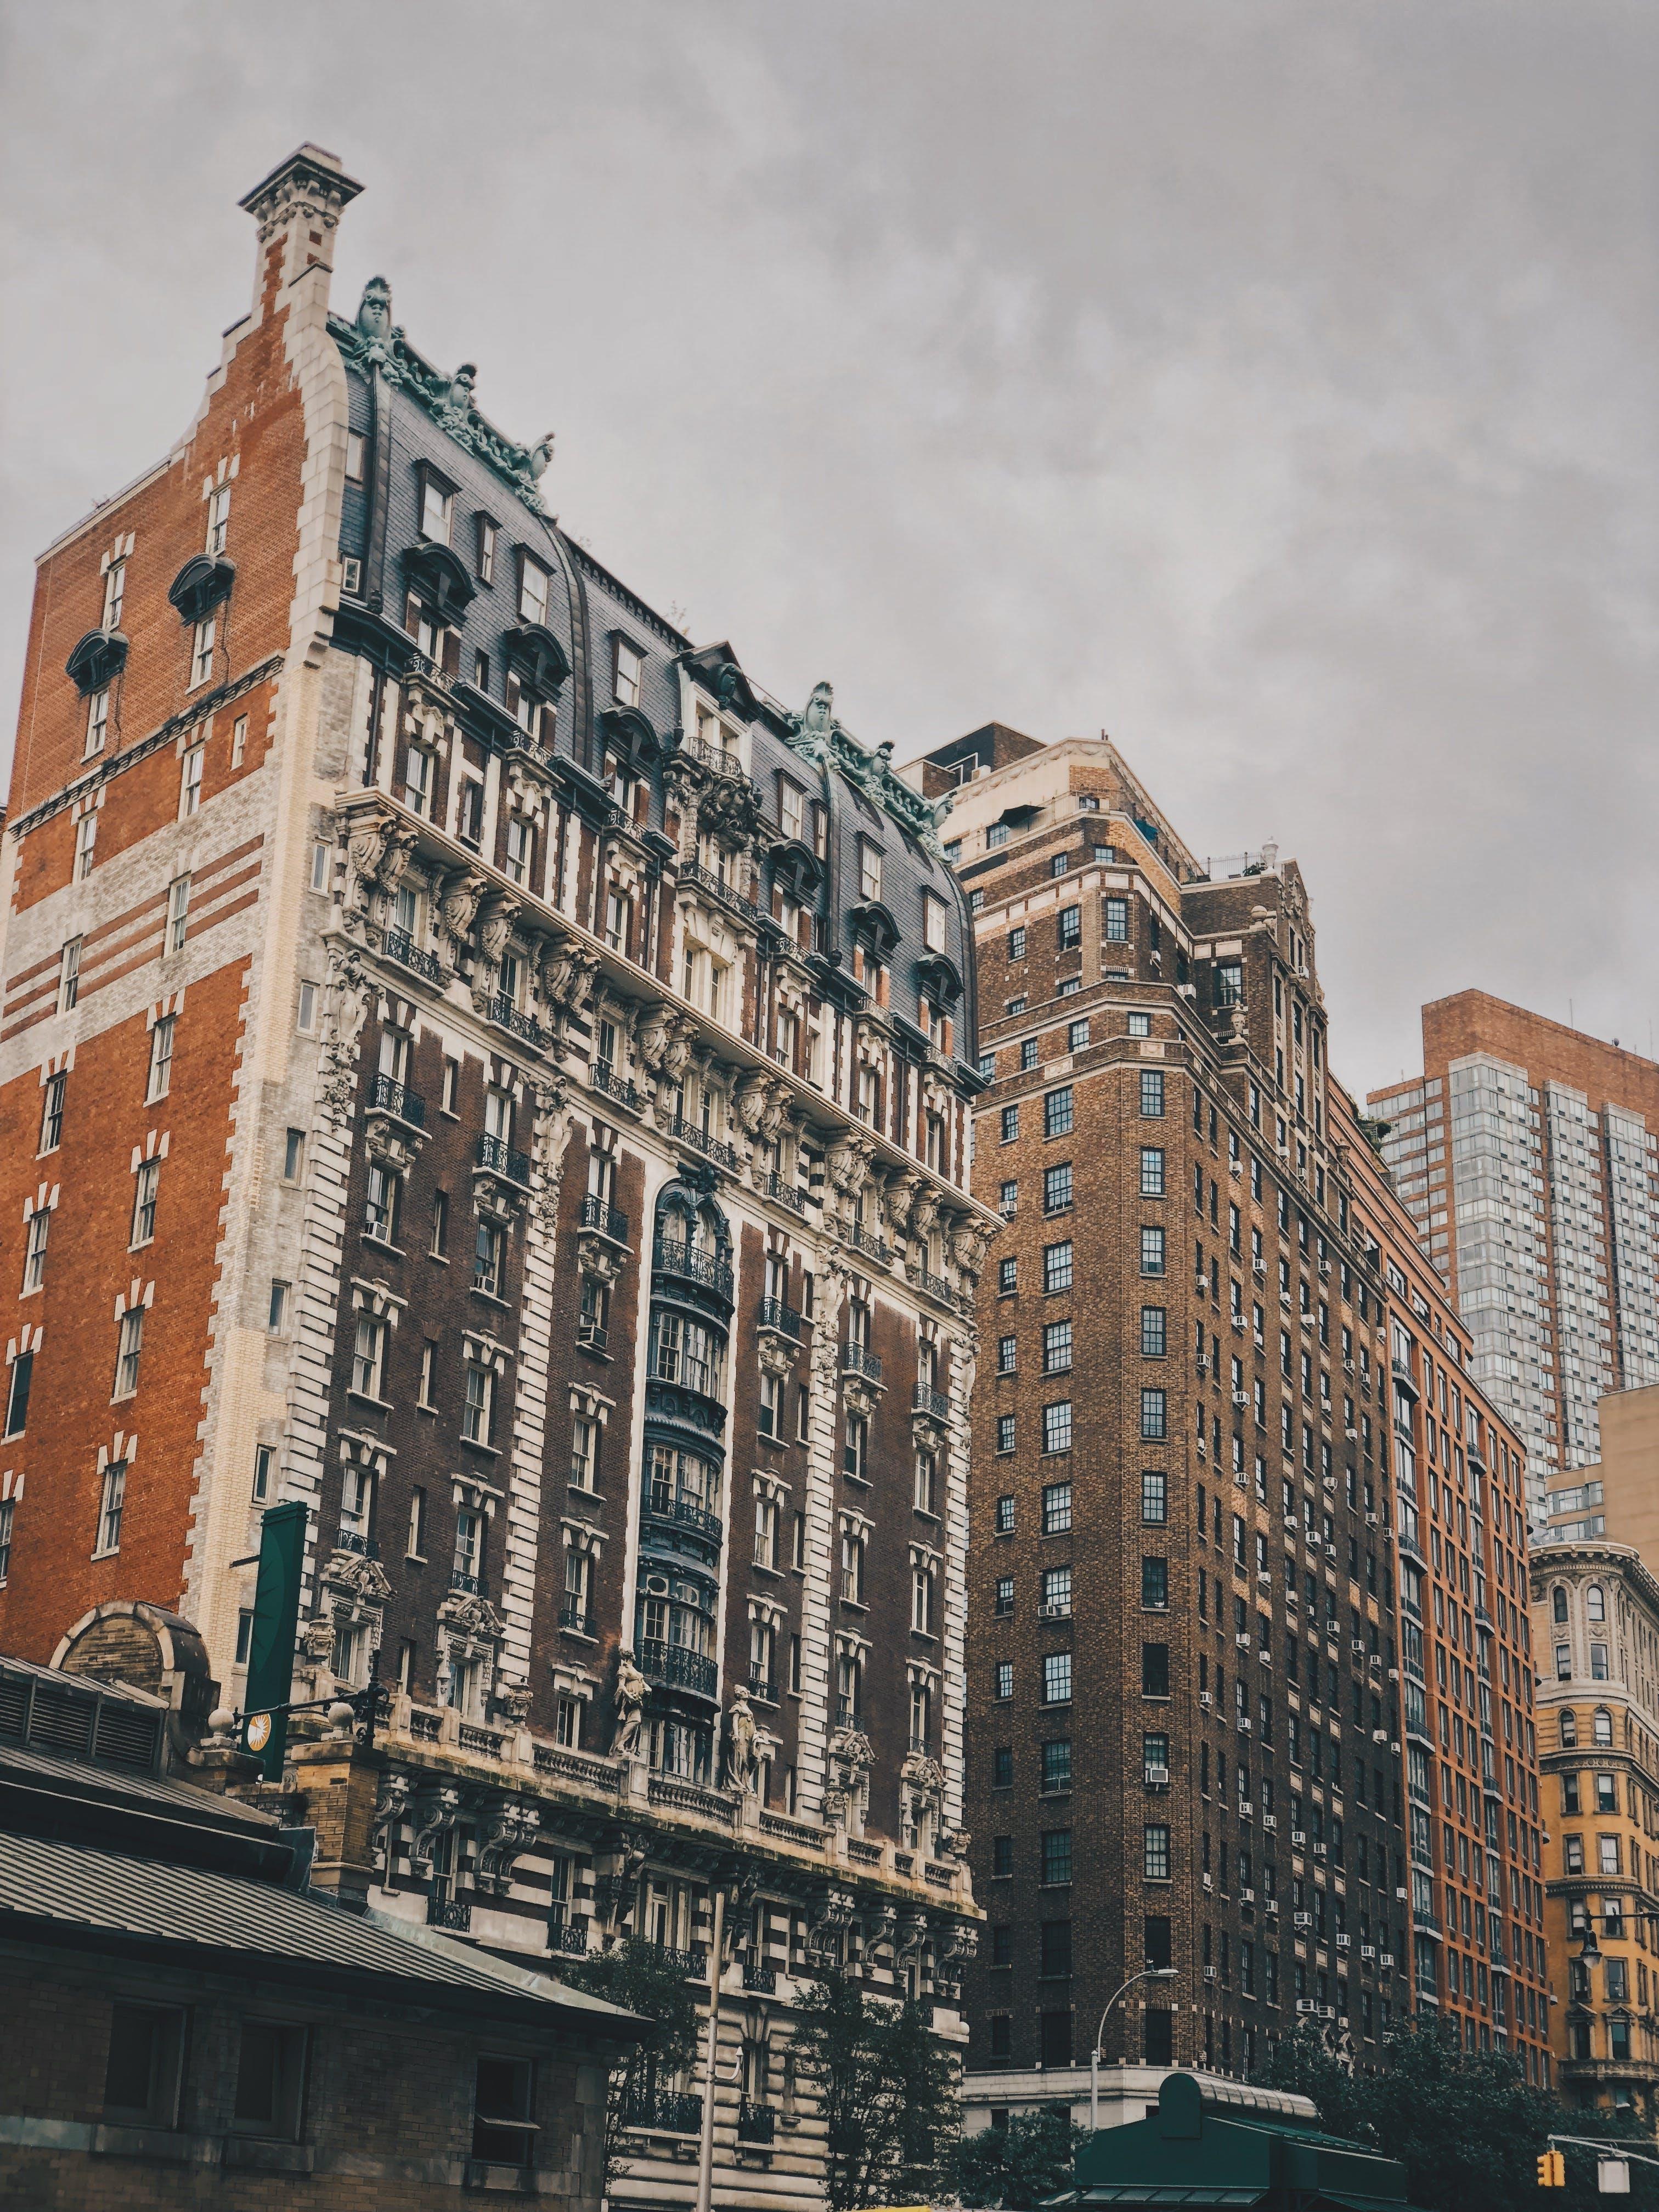 Photography of Tall Buildings Facade